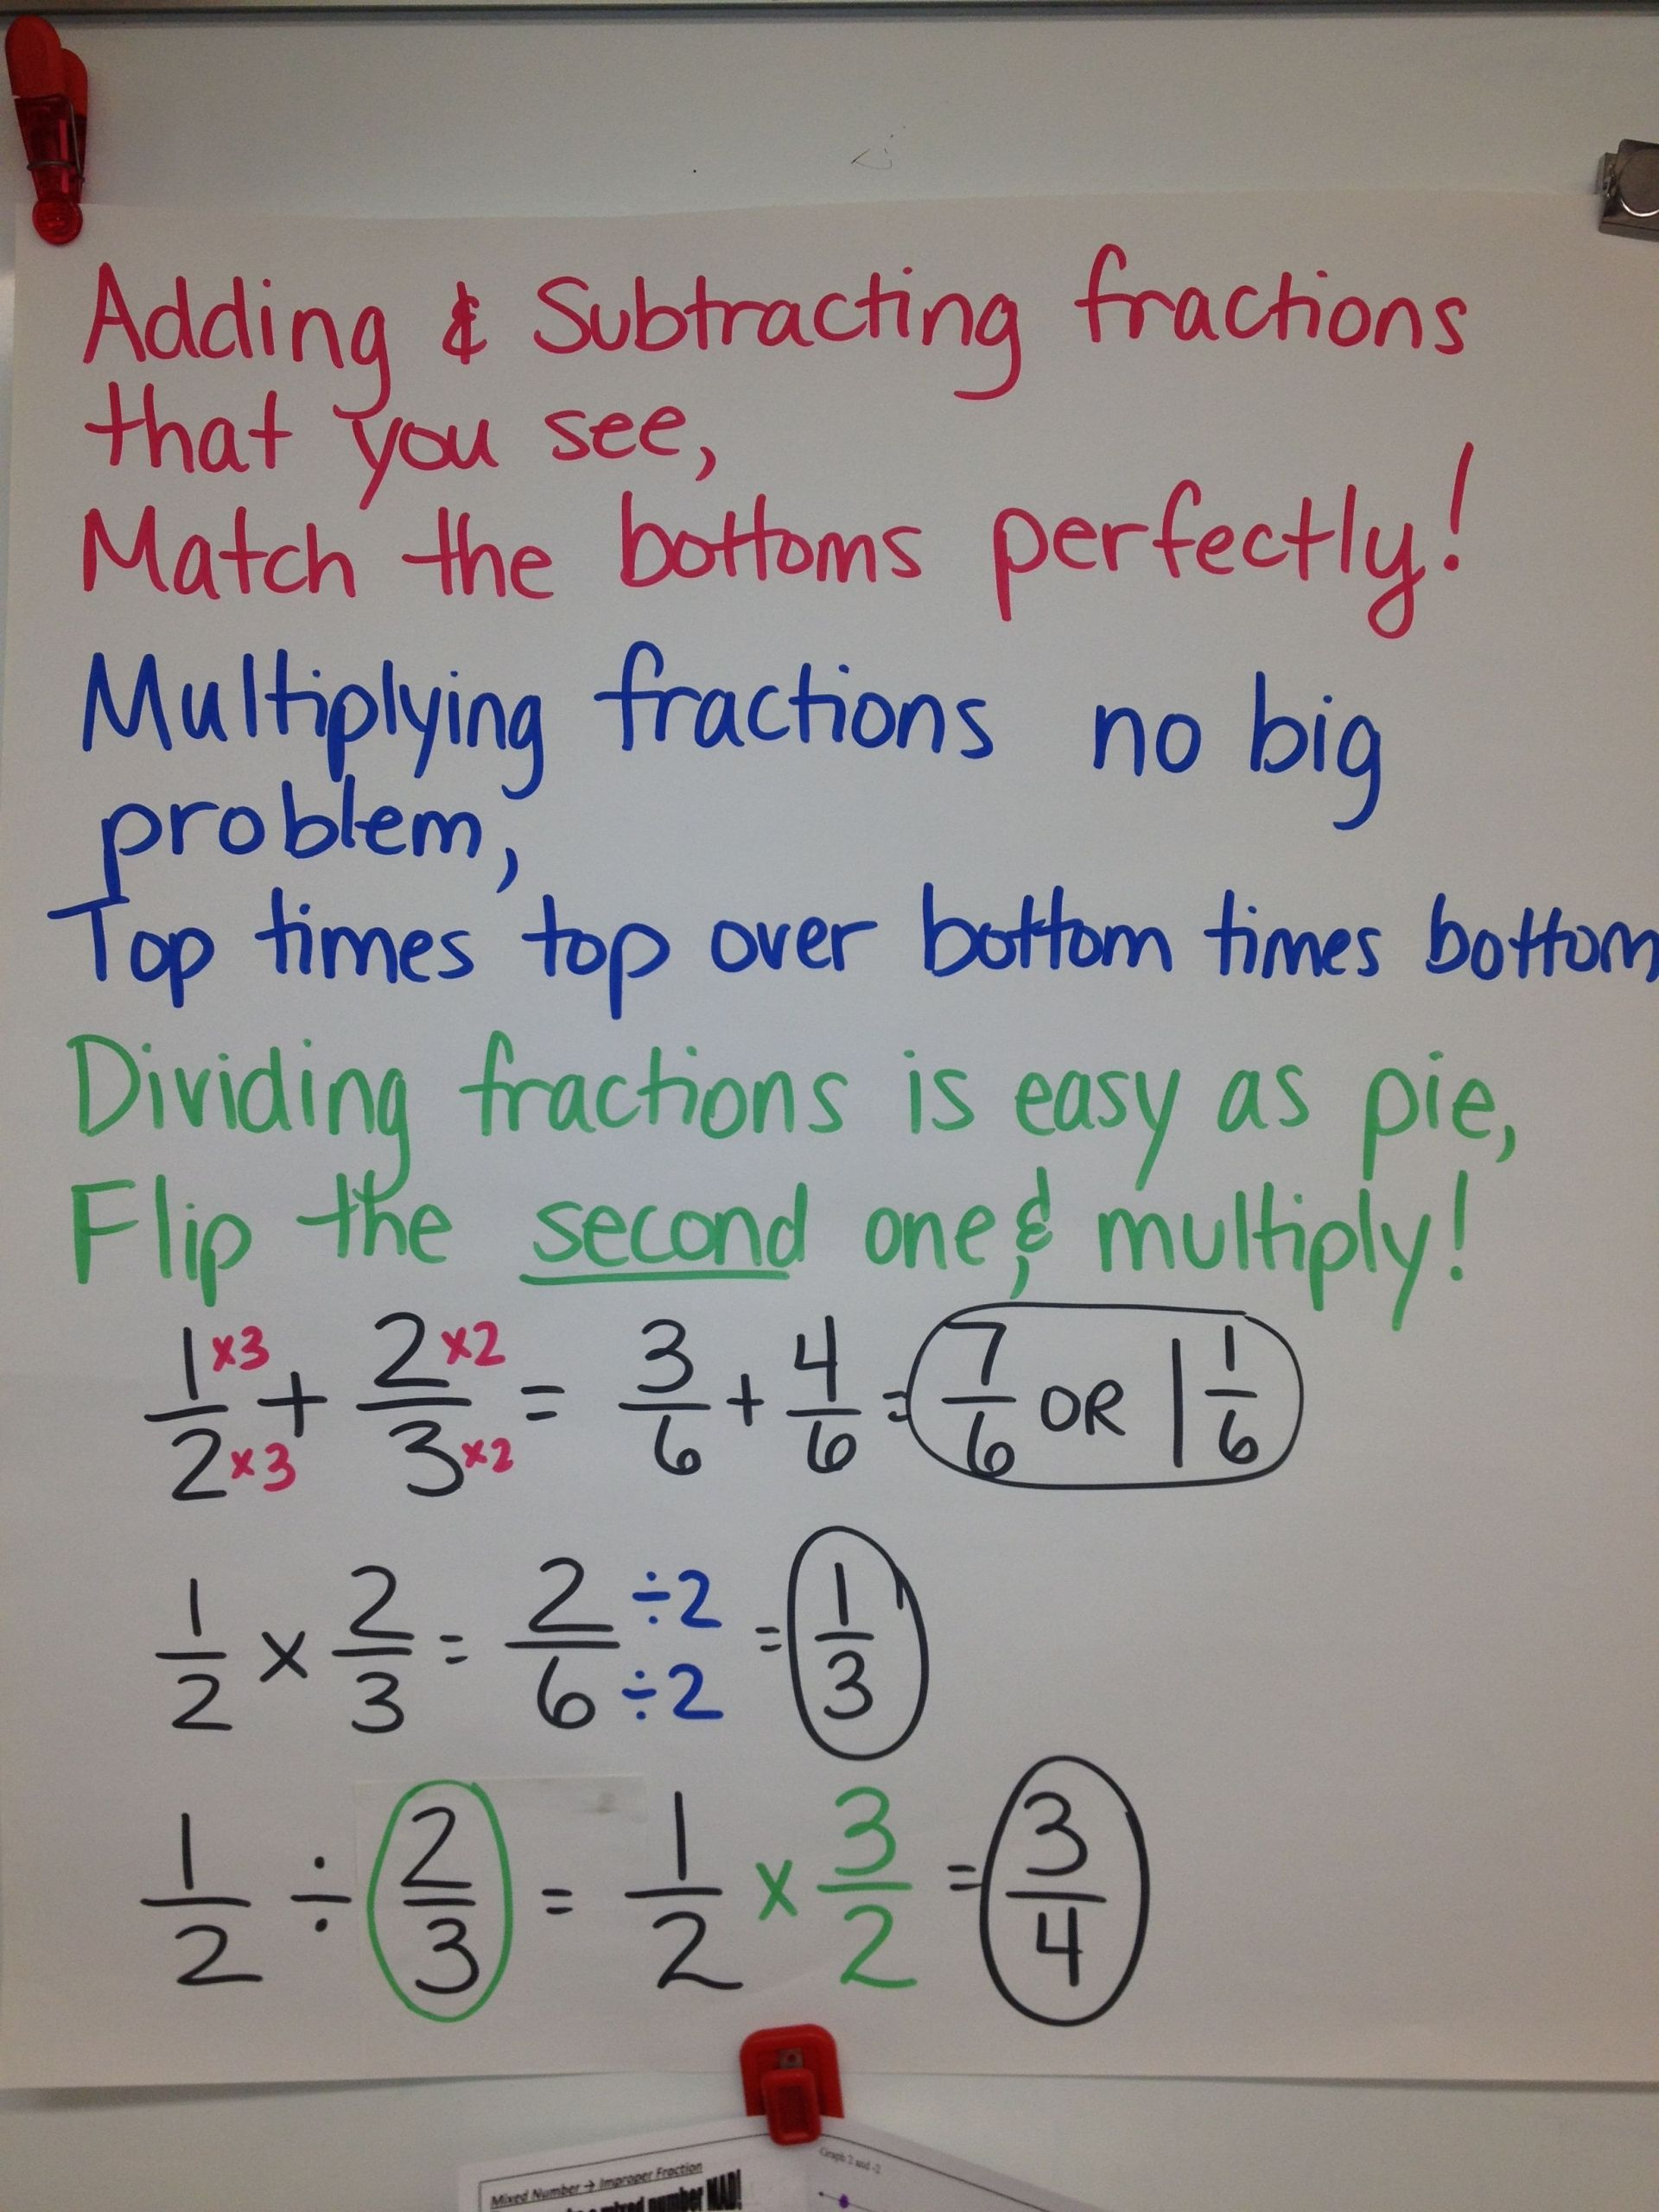 3 Worksheet Cross Multiplication Fractions Fifth Grade In